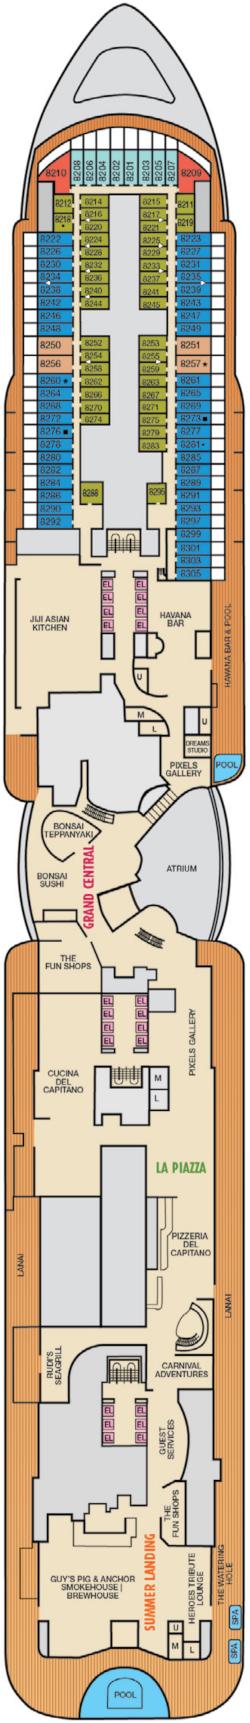 Mardi Gras Deck 8 Deck Plan